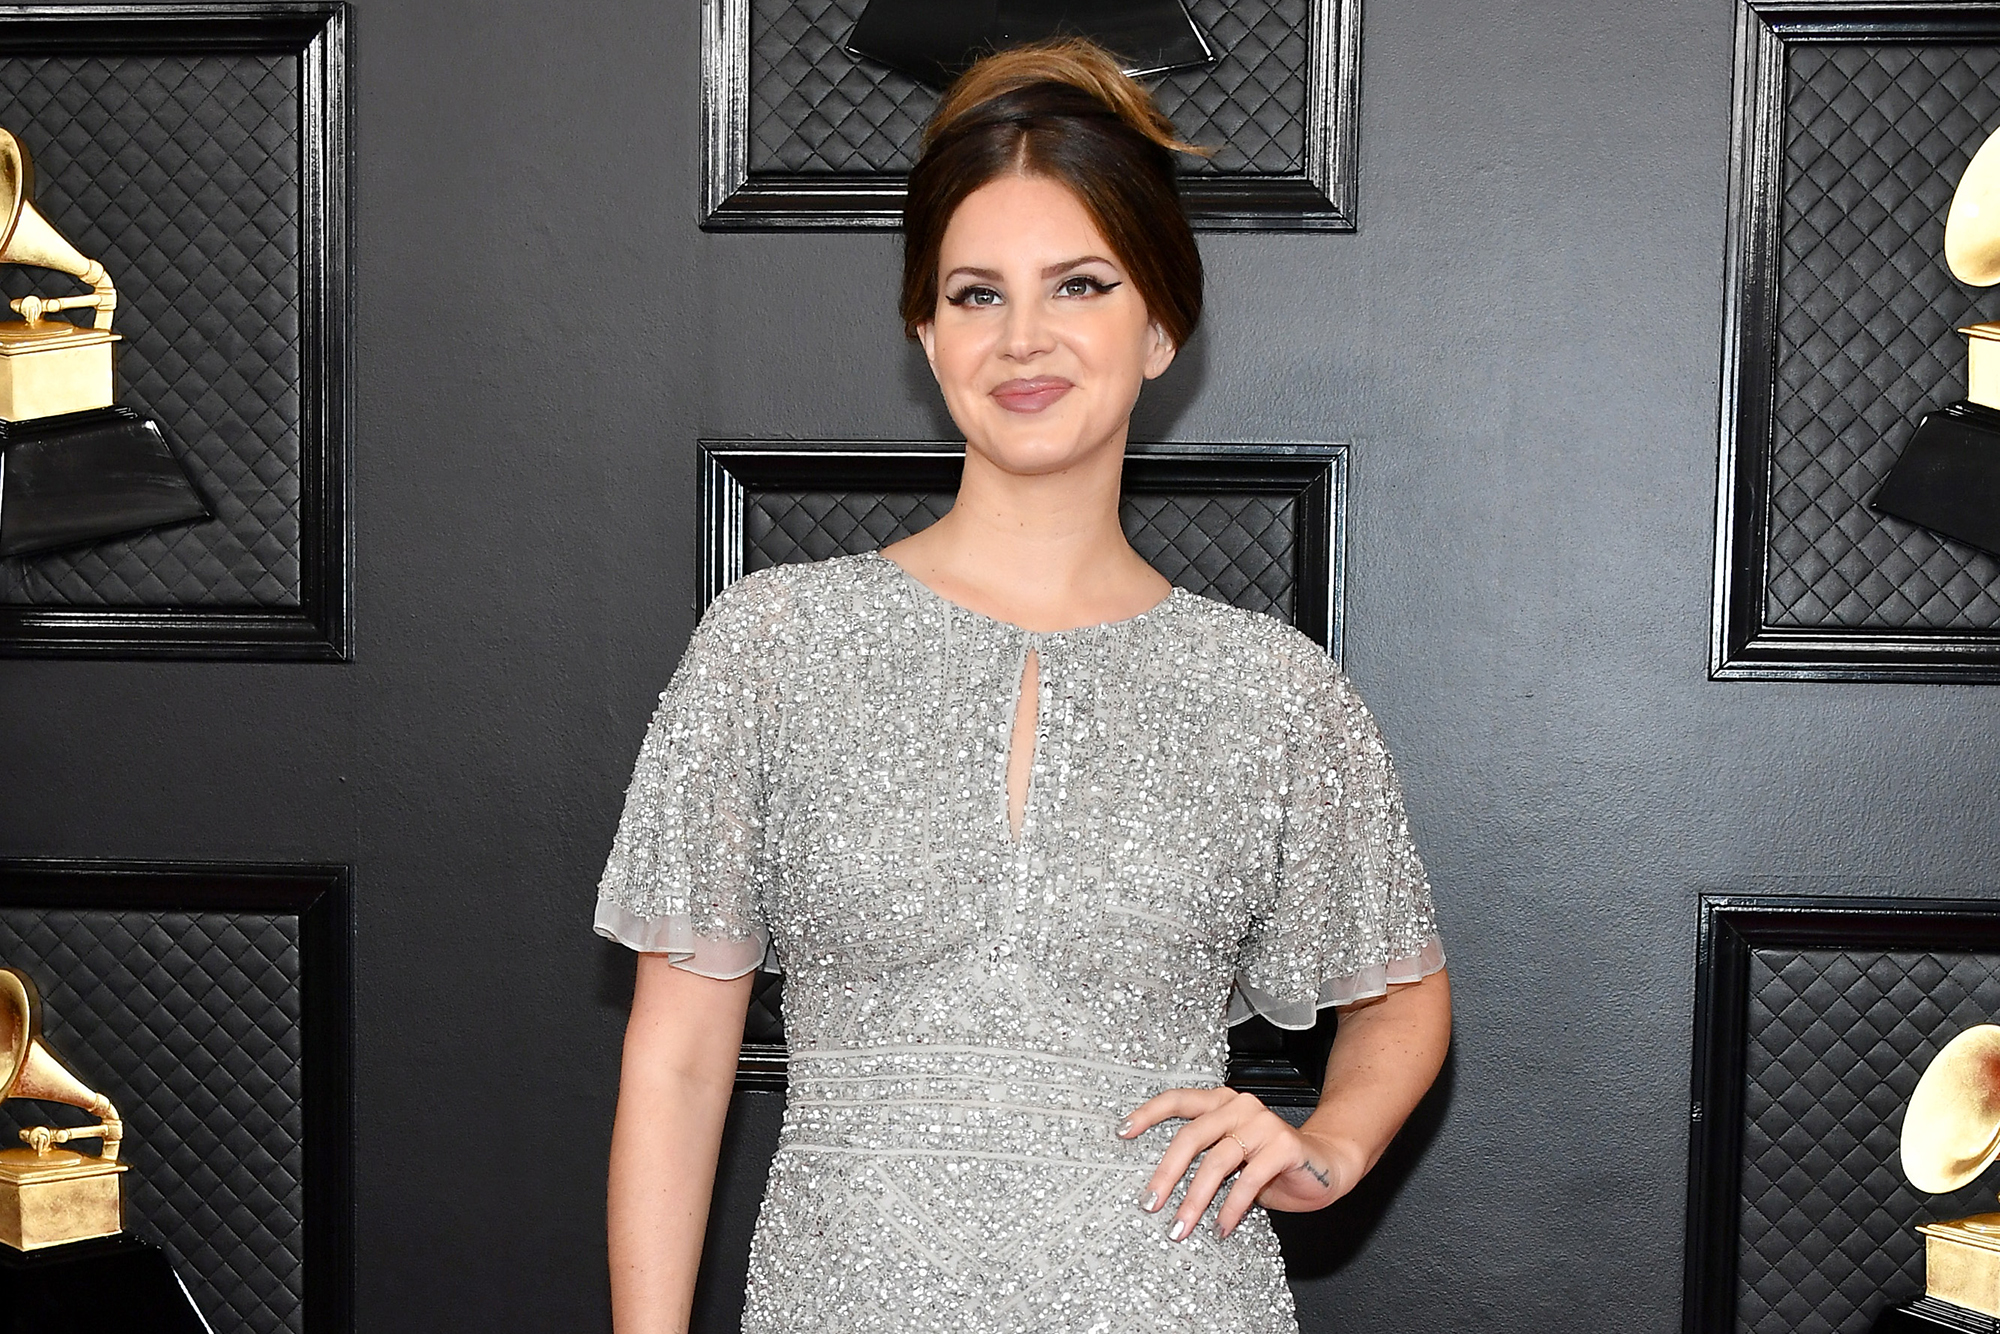 Lana Del Rey   The Jewellery Editor